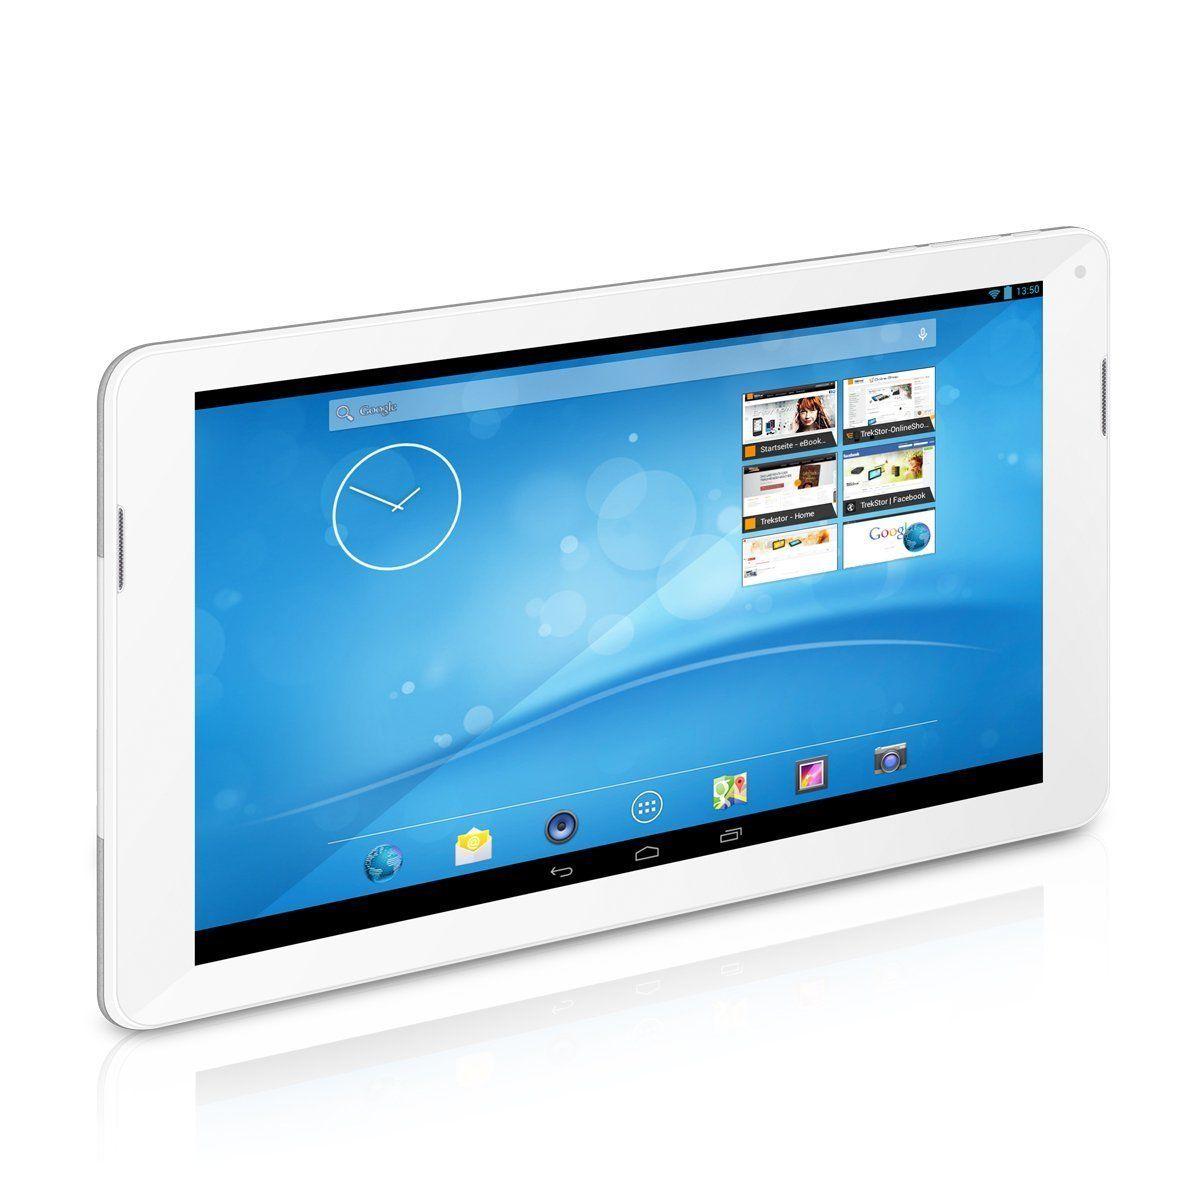 Trekstor 10.1 Zoll 25,7cm SurfTab breeze Tablet 1GB 8GB 4 x 1,3 GHz Android 4.4